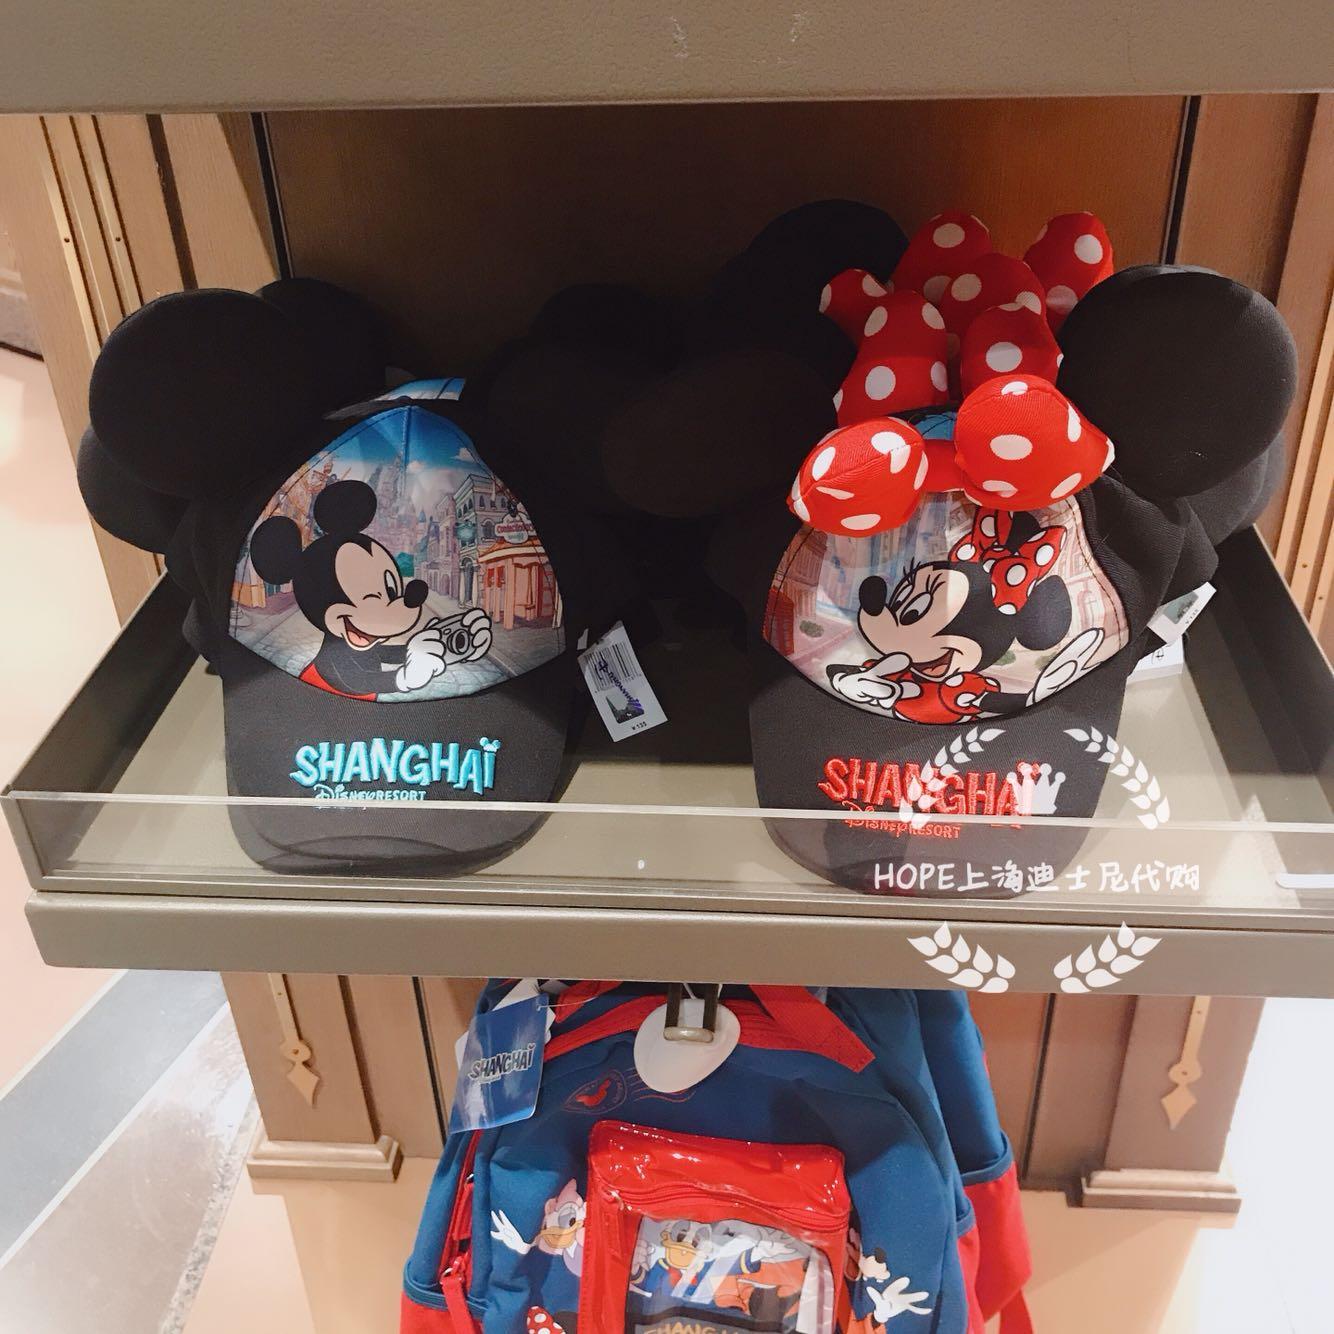 HOPE上海迪士尼代购 米奇米妮shanghai系列卡通遮阳帽太阳帽